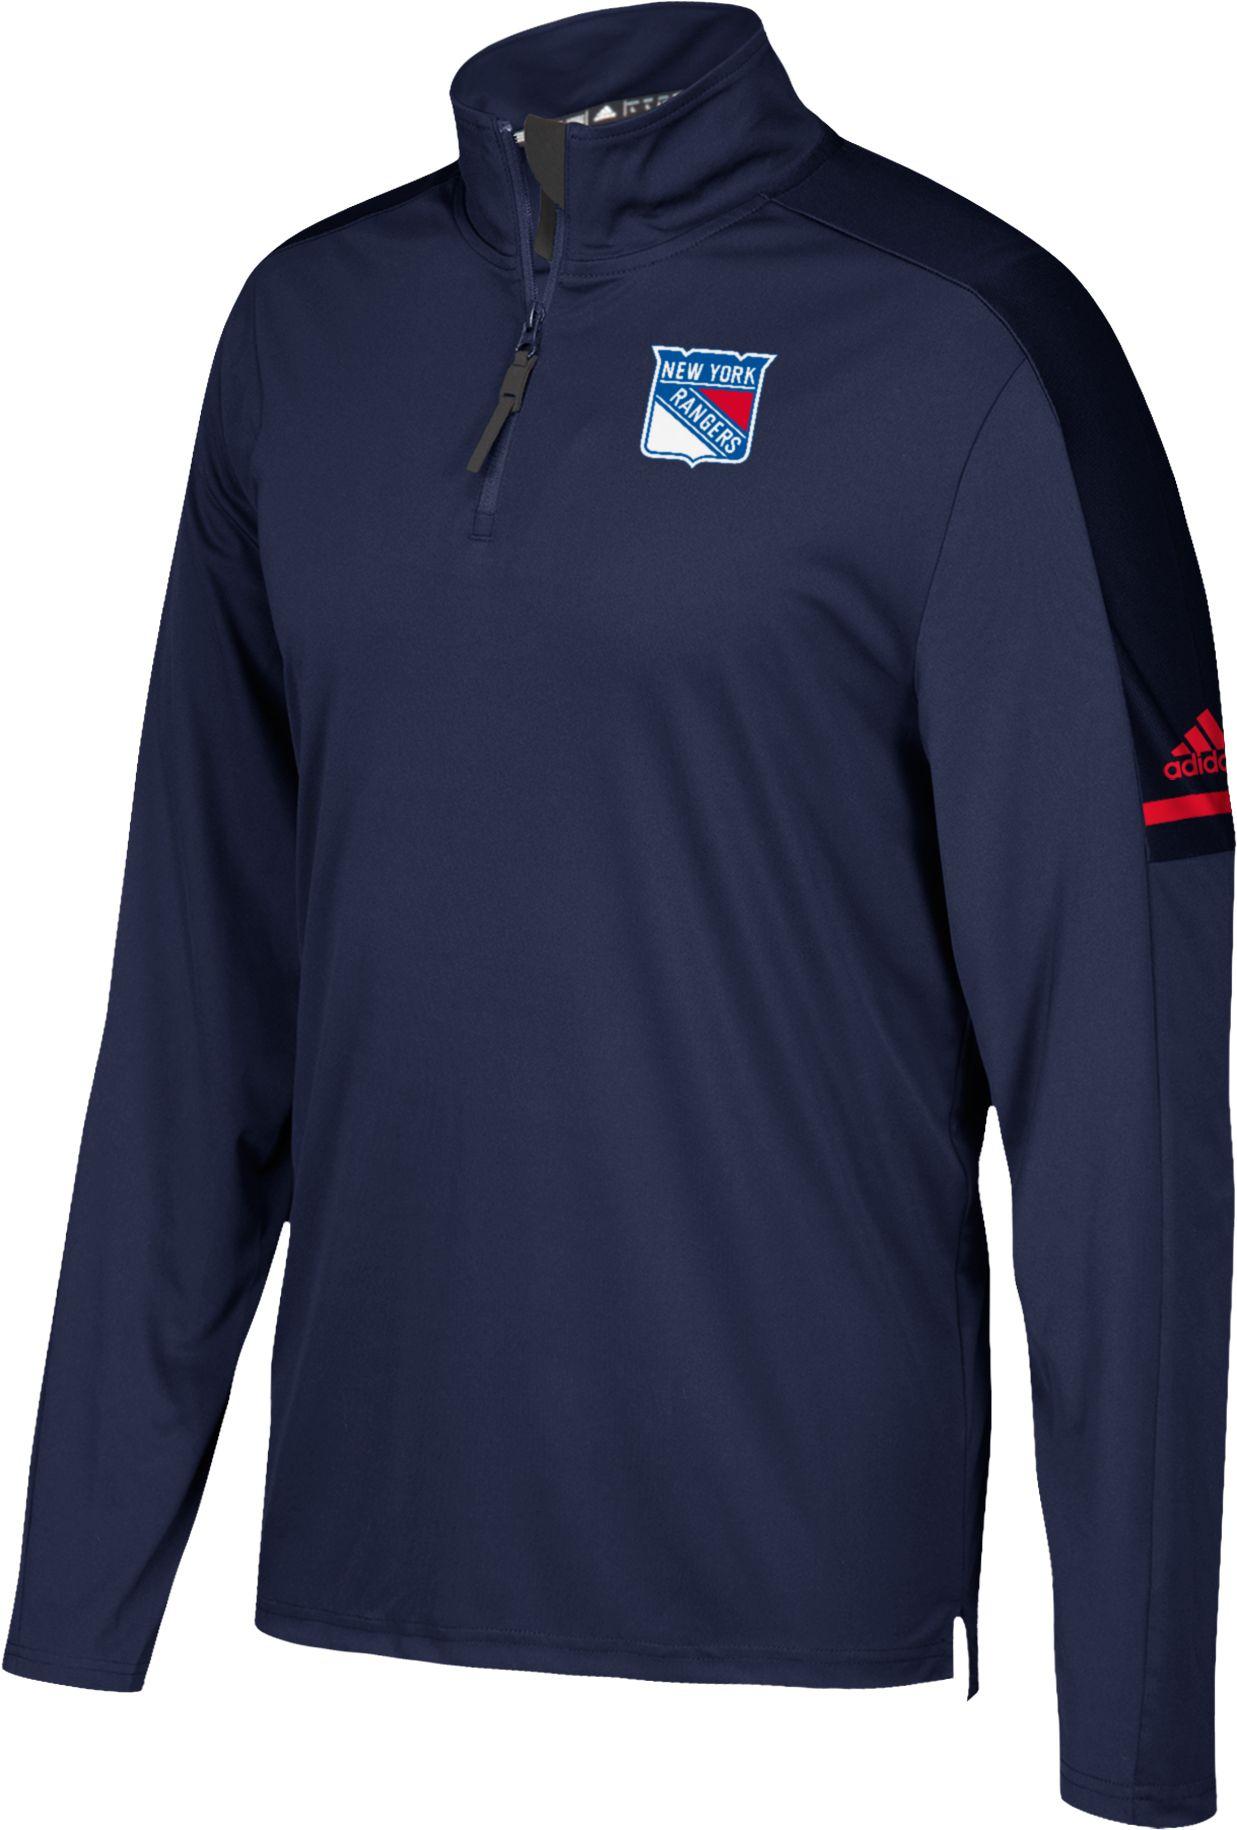 ... New Product Image · adidas Mens New York Rangers Authentic Pro Navy  Quarter-Zip Jacket New York Rangers Hoodies ... 91af8fd3d